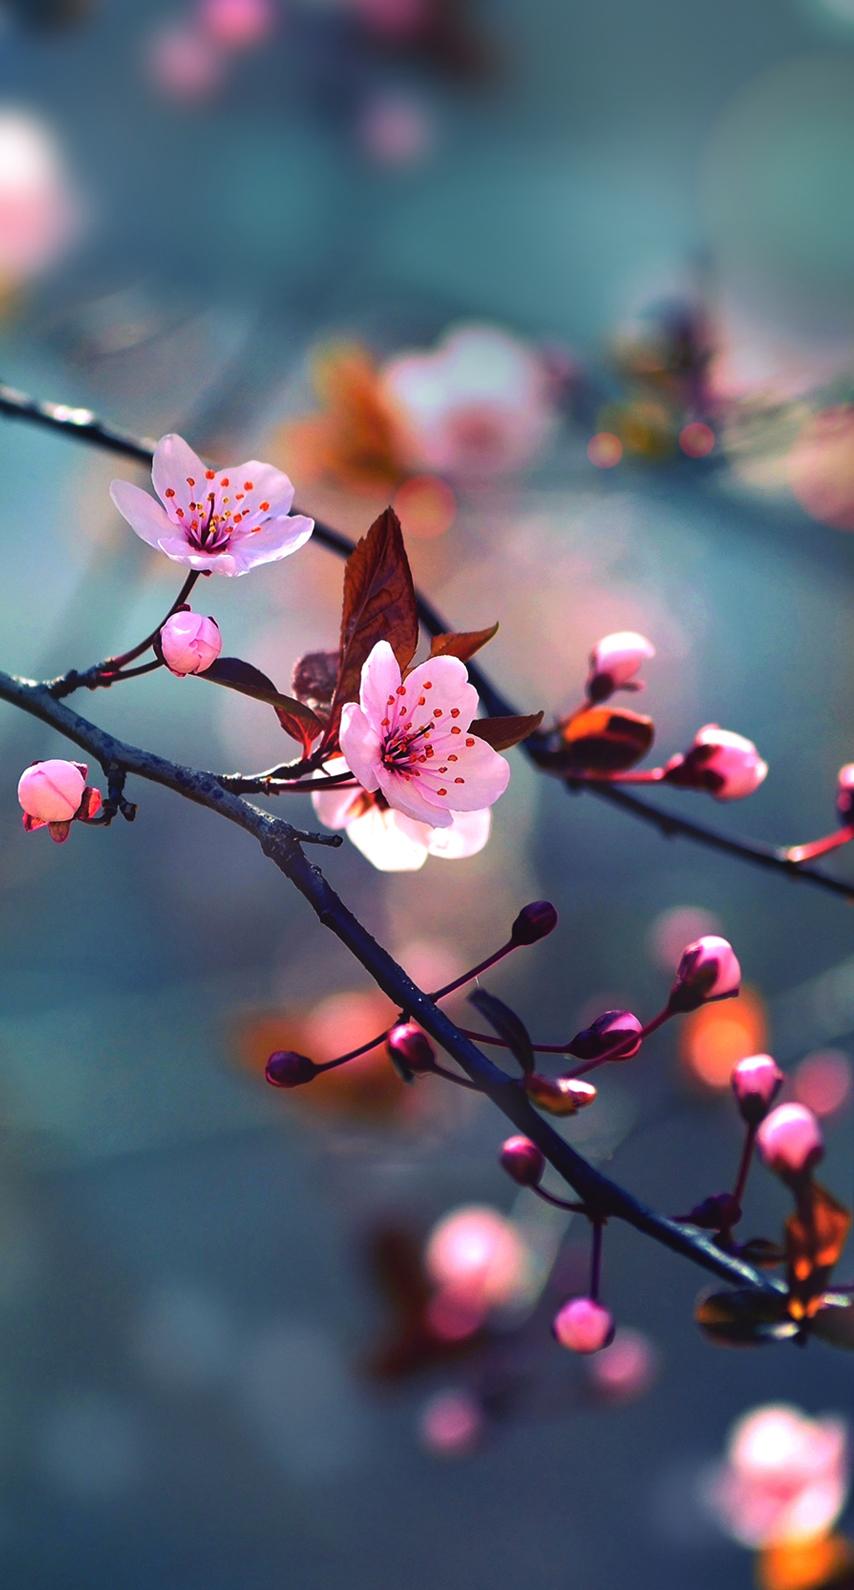 sunlight, cherry blossom